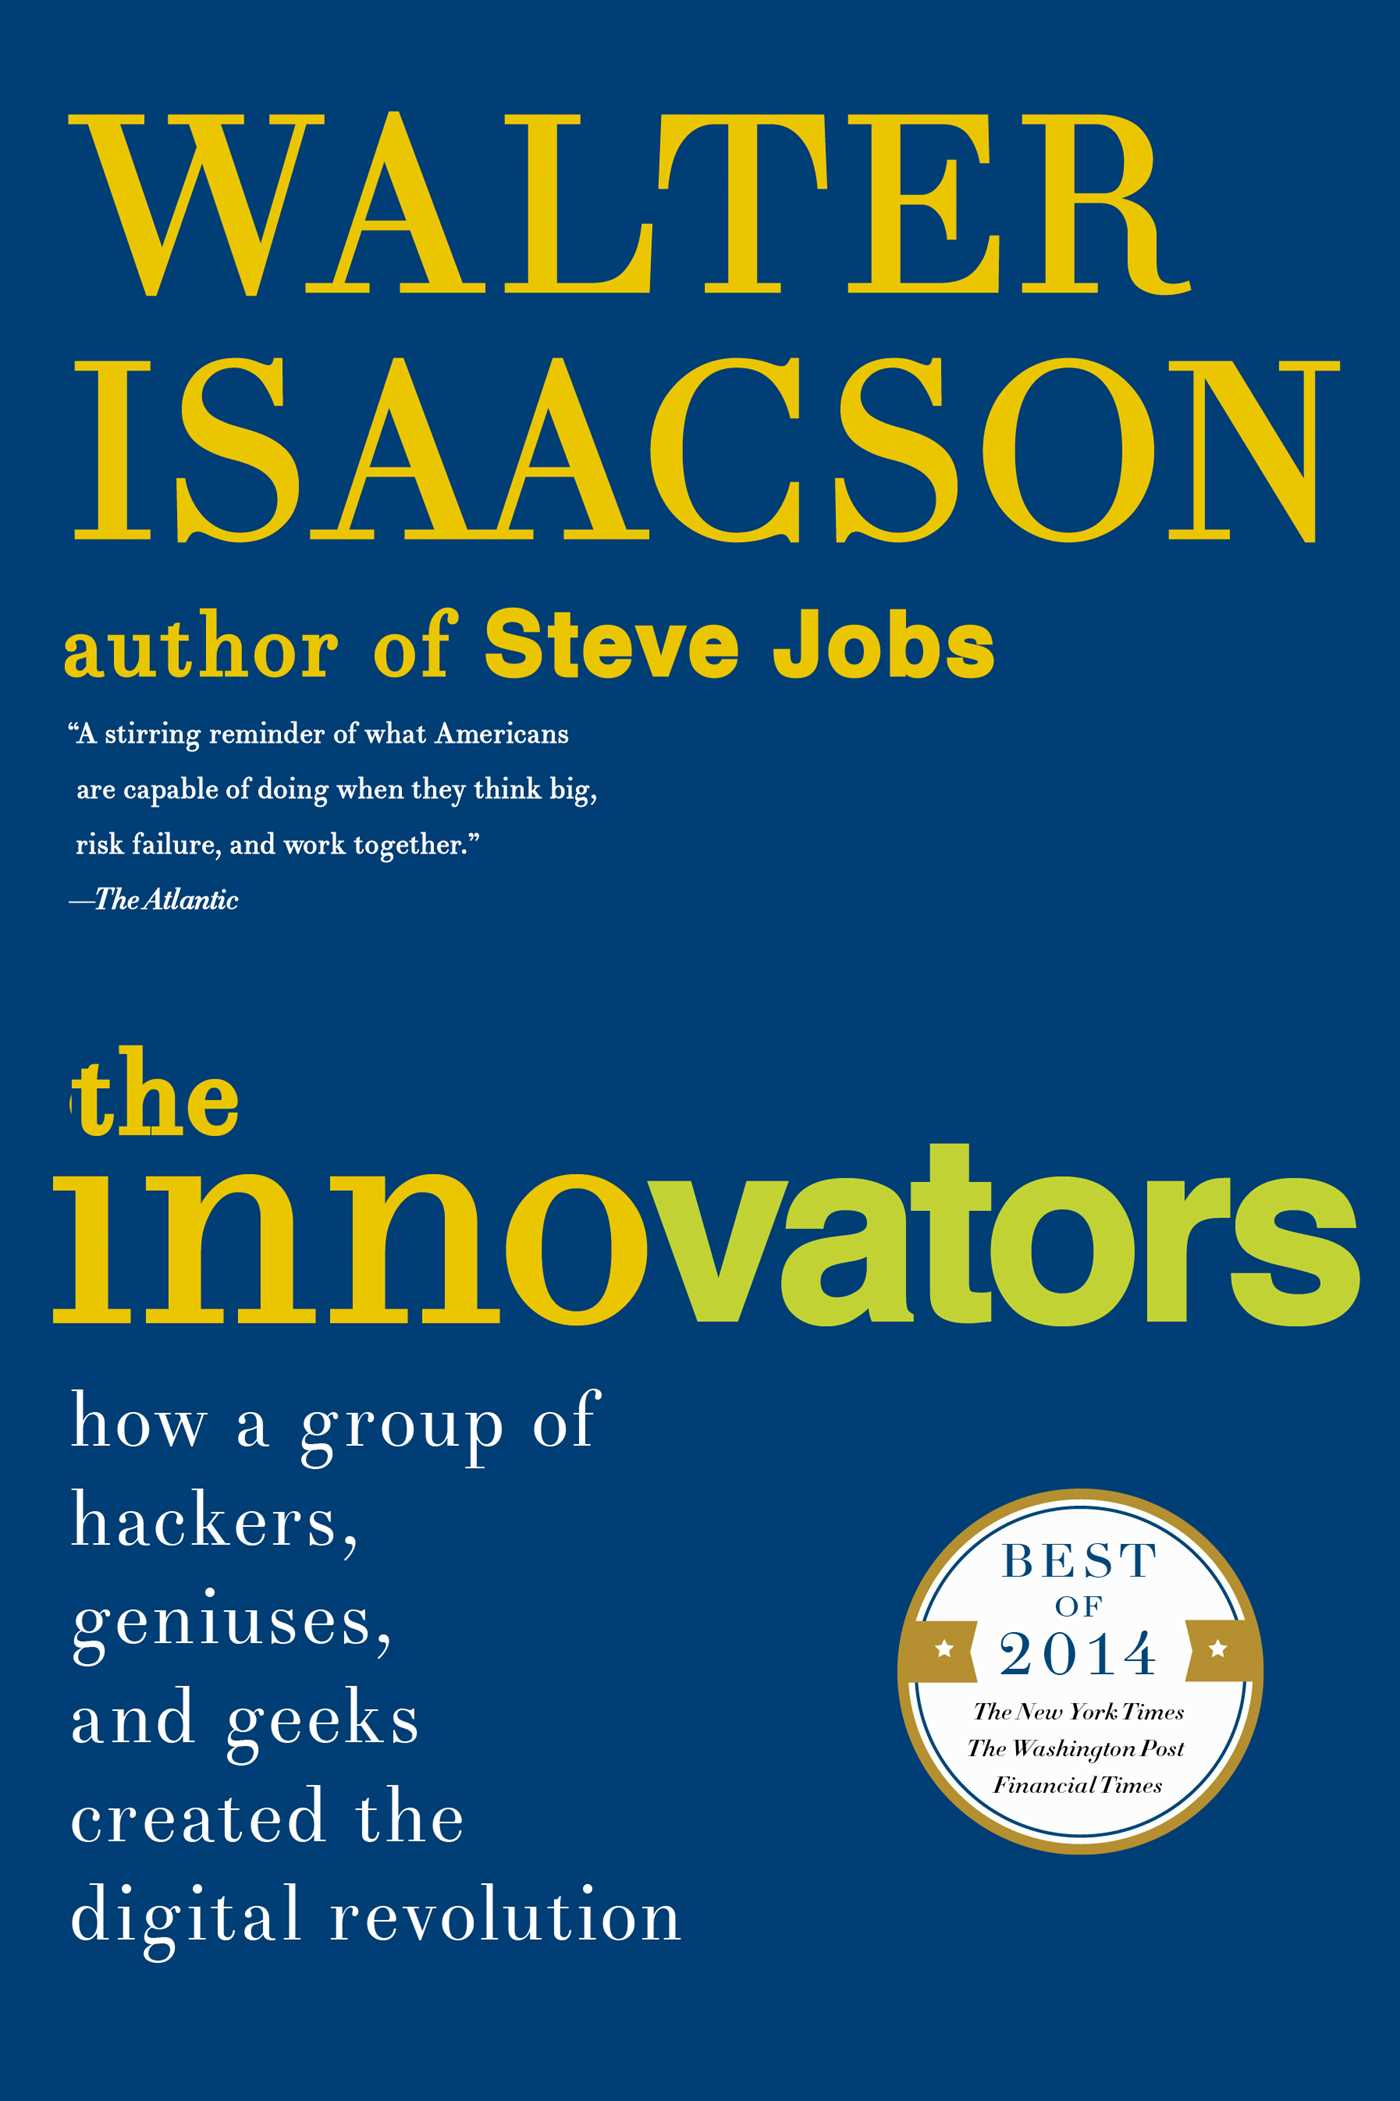 The innovators 9781476708713 hr